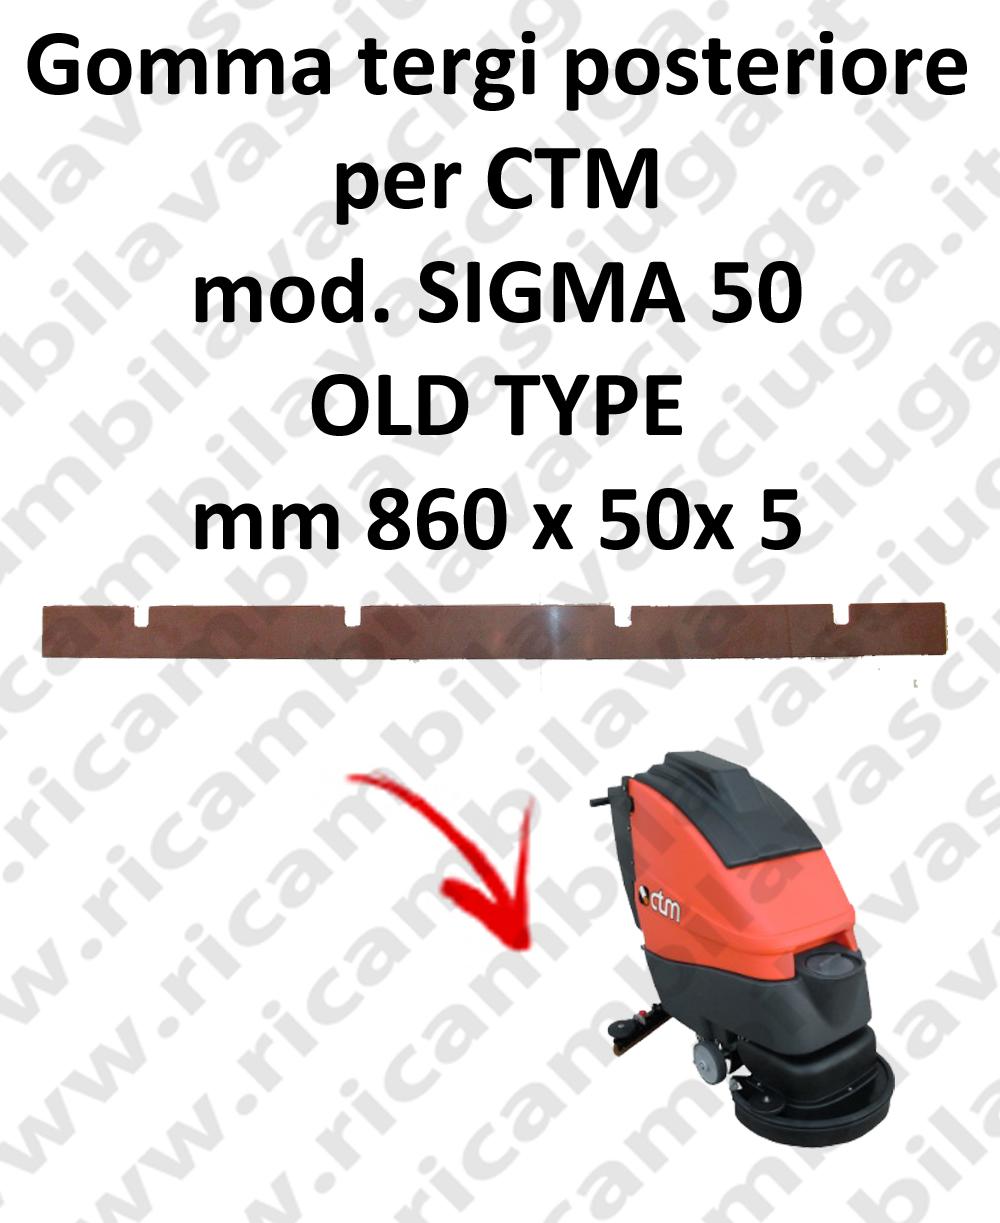 SIGMA 50 OLD TYPE - GOMMA TERGI posteriore per lavapavimenti CTM